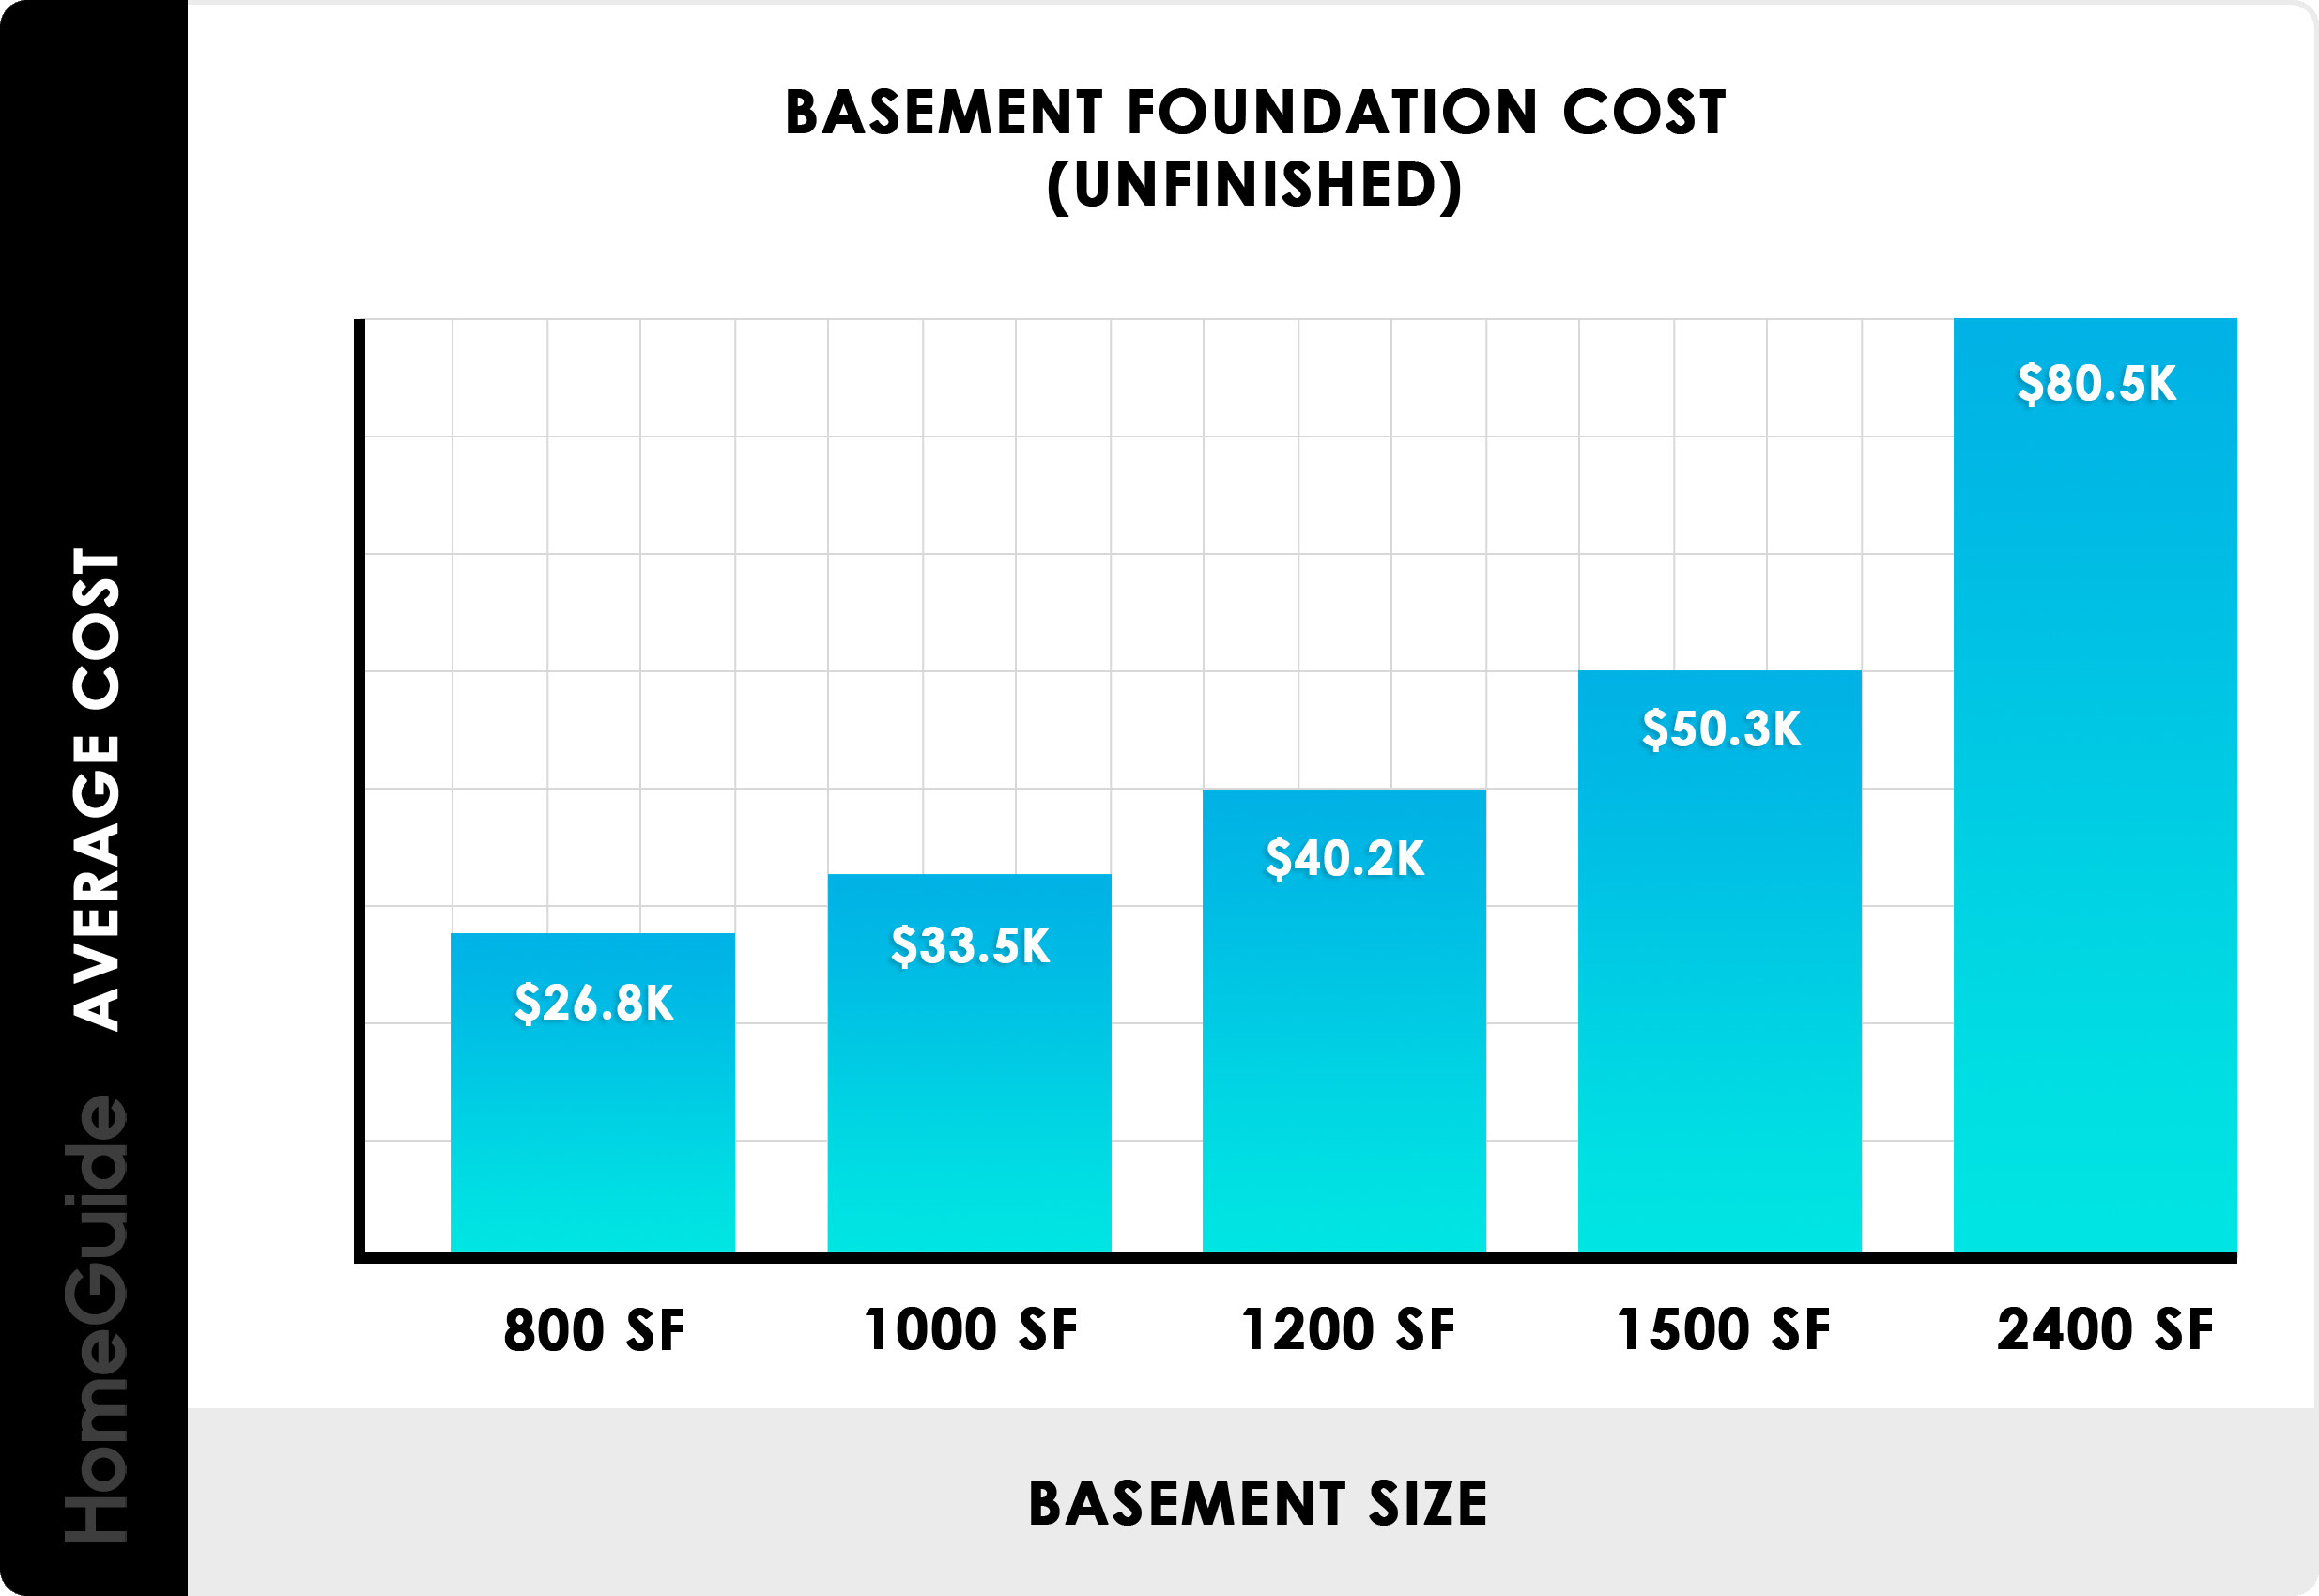 2021 Foundation Costs Build Concrete Basement Cost Calculator